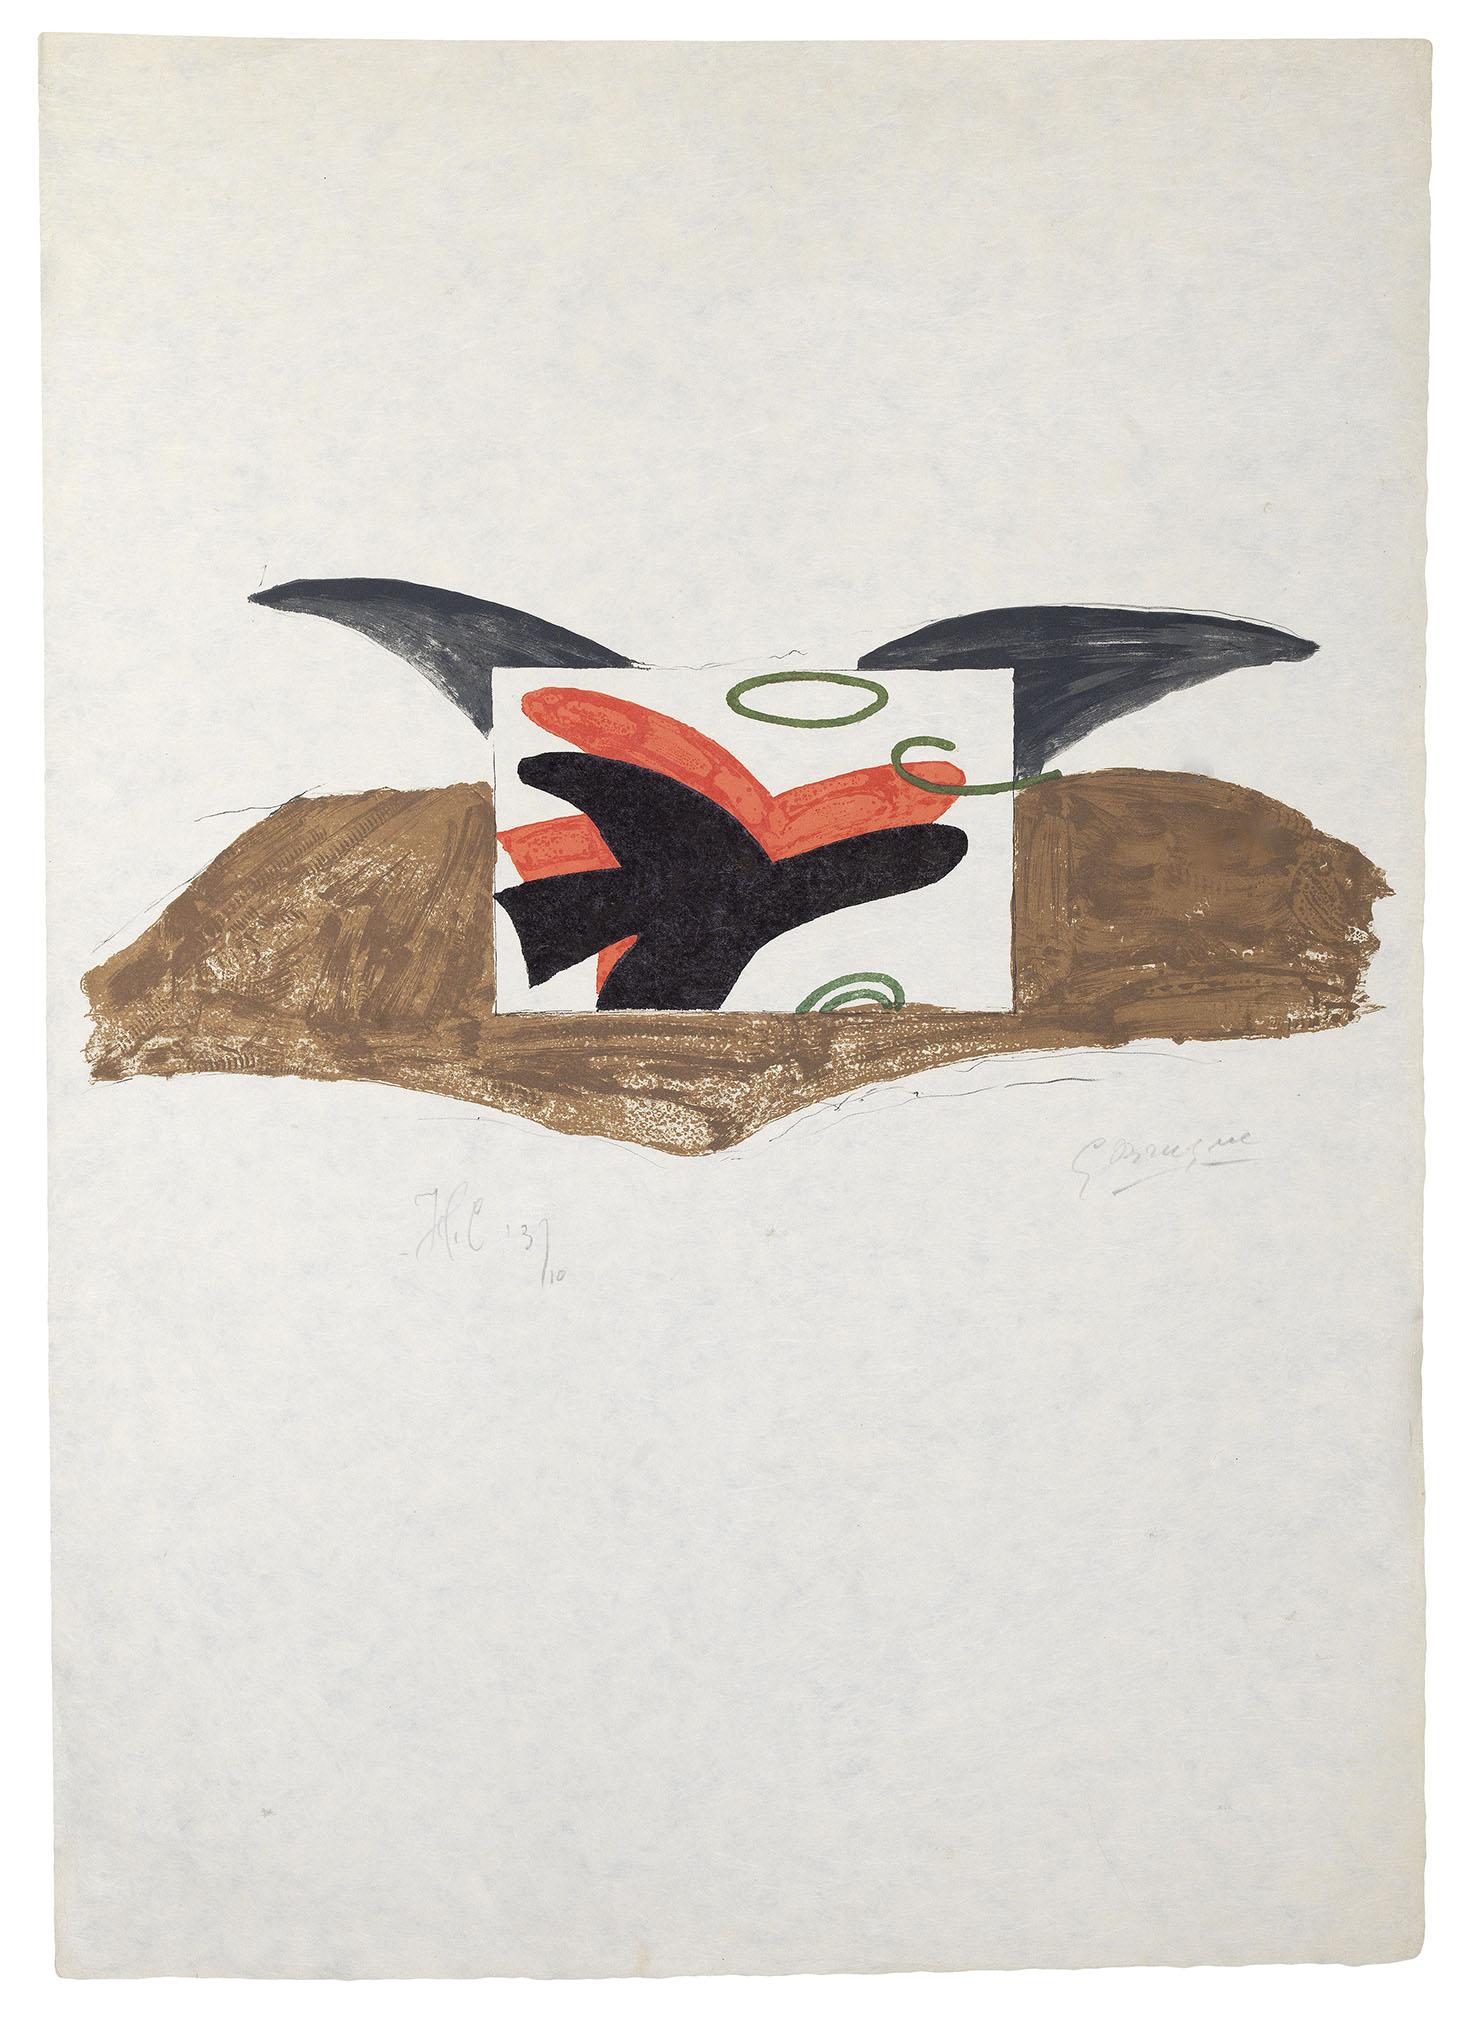 L'Amitie - Affiche pour Lettera Amorosa von Rene Char